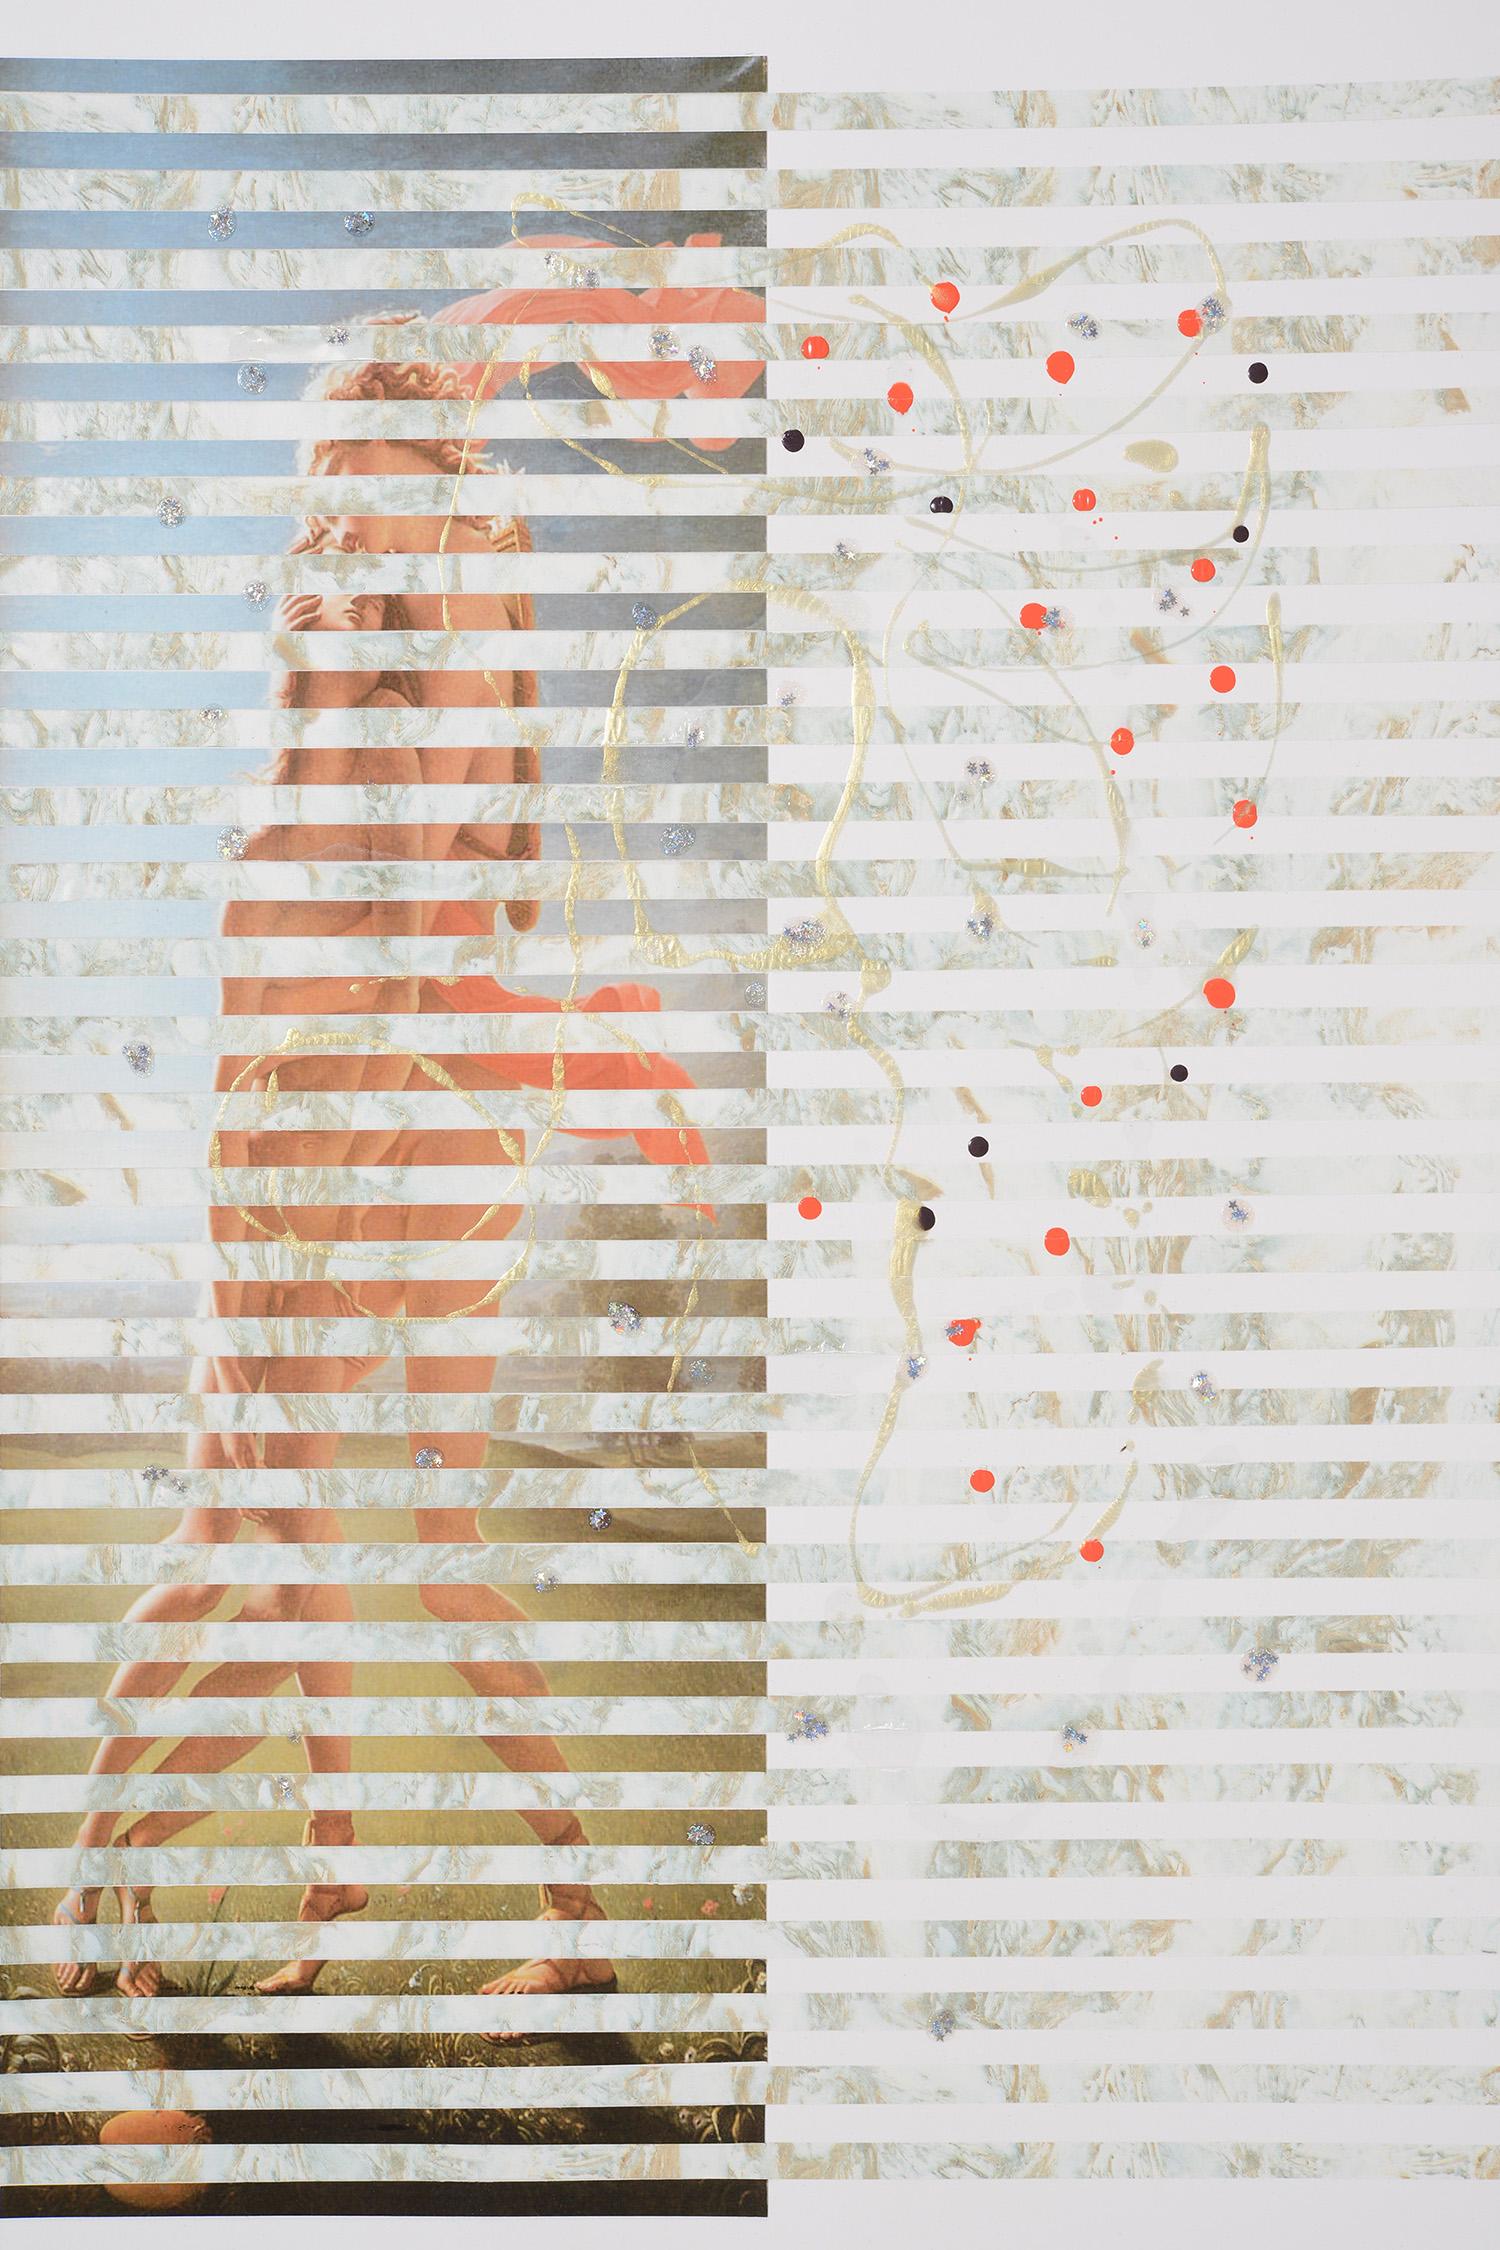 Markues  Falling Stars, 2013  mixed media on paper  60 x 40 cm